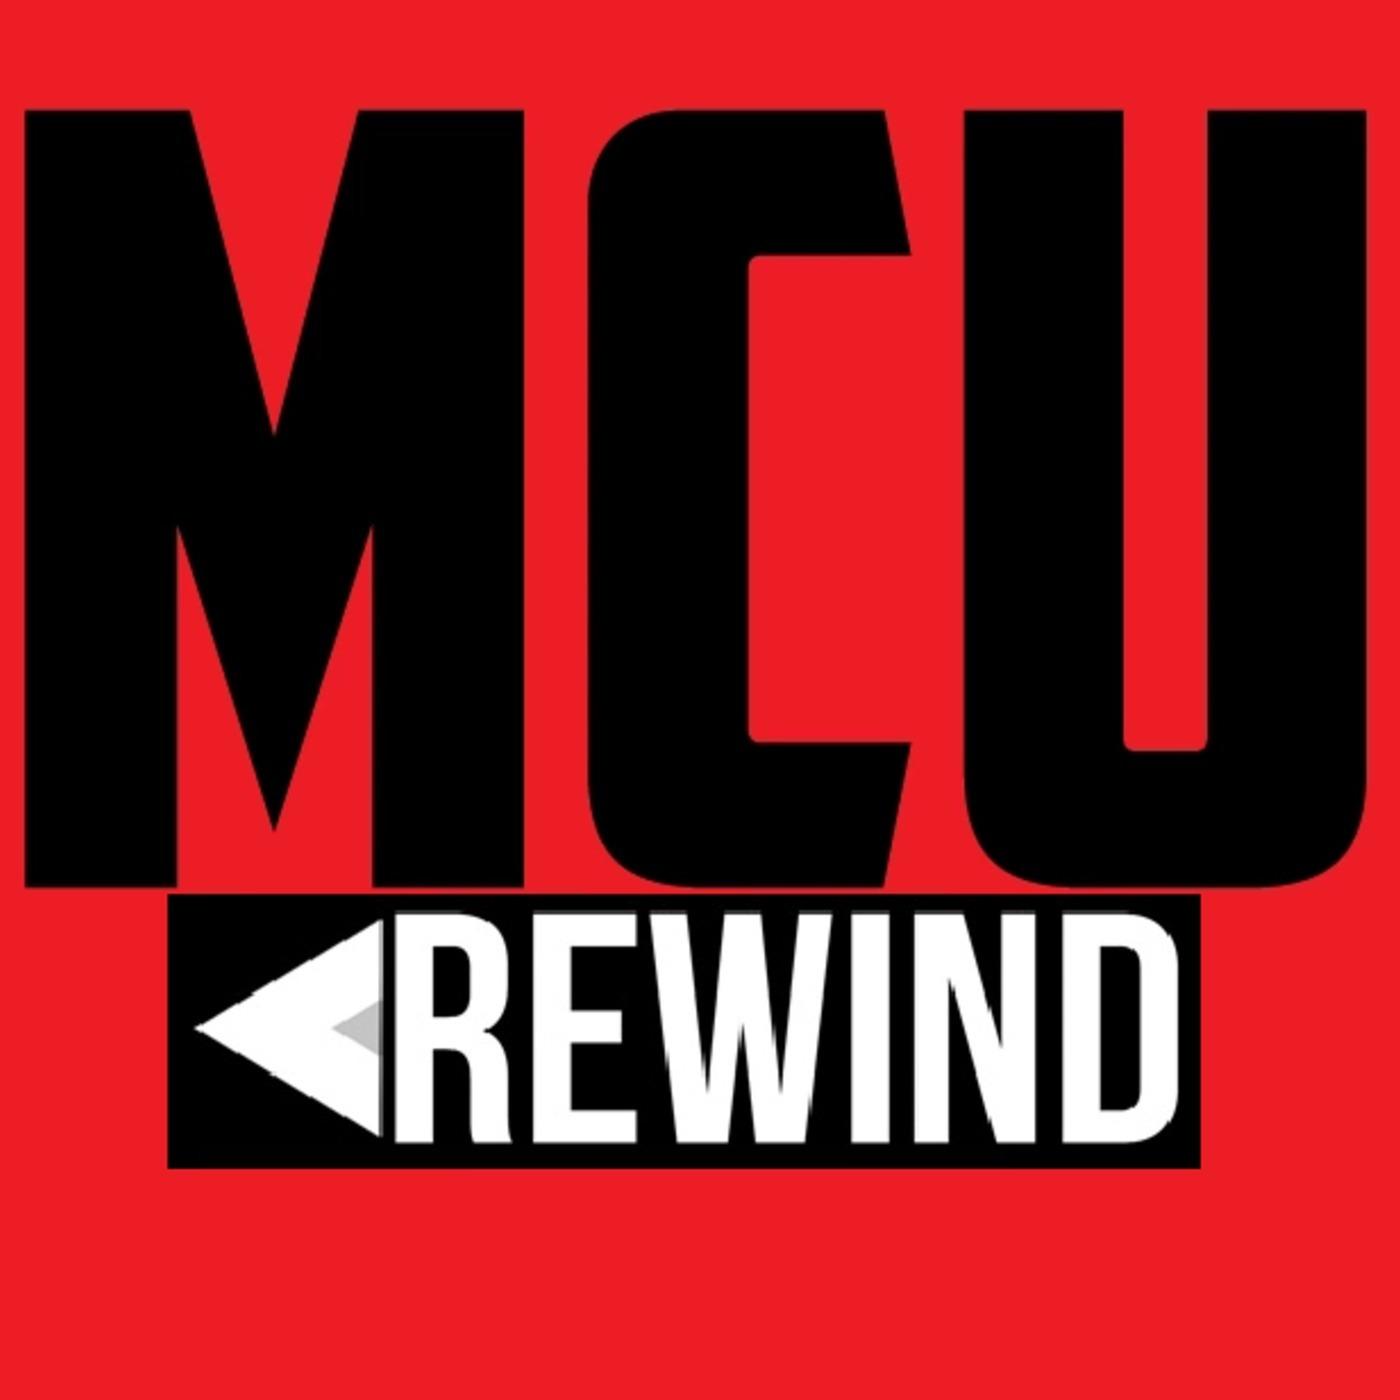 MCU Rewind: Agents of S.H.I.E.L.D.: S1 E14 - T.A.H.I.T.I.